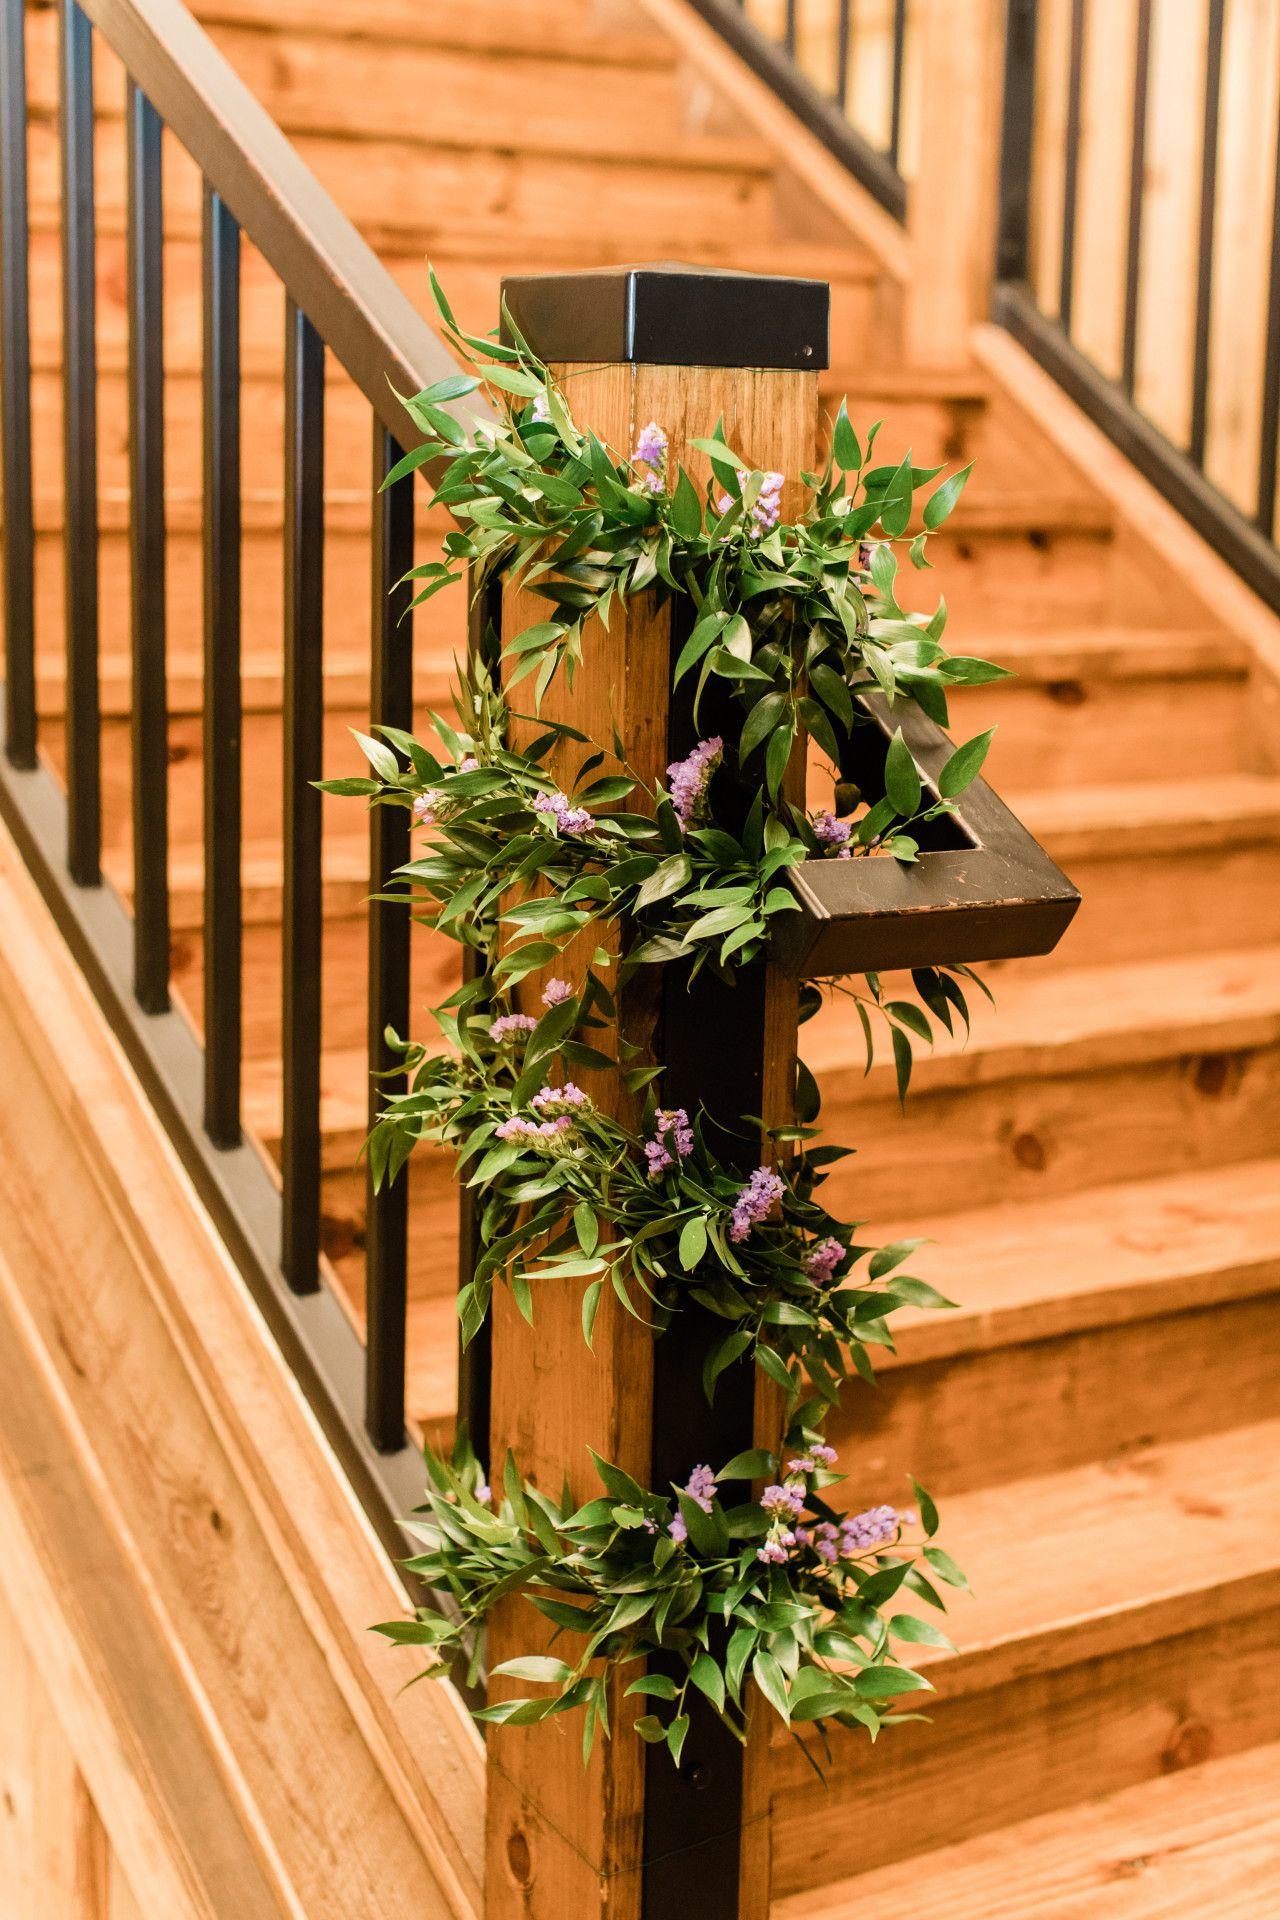 Lavender themed wedding decor  wedding staircase decor  natural wedding decorations  wedding